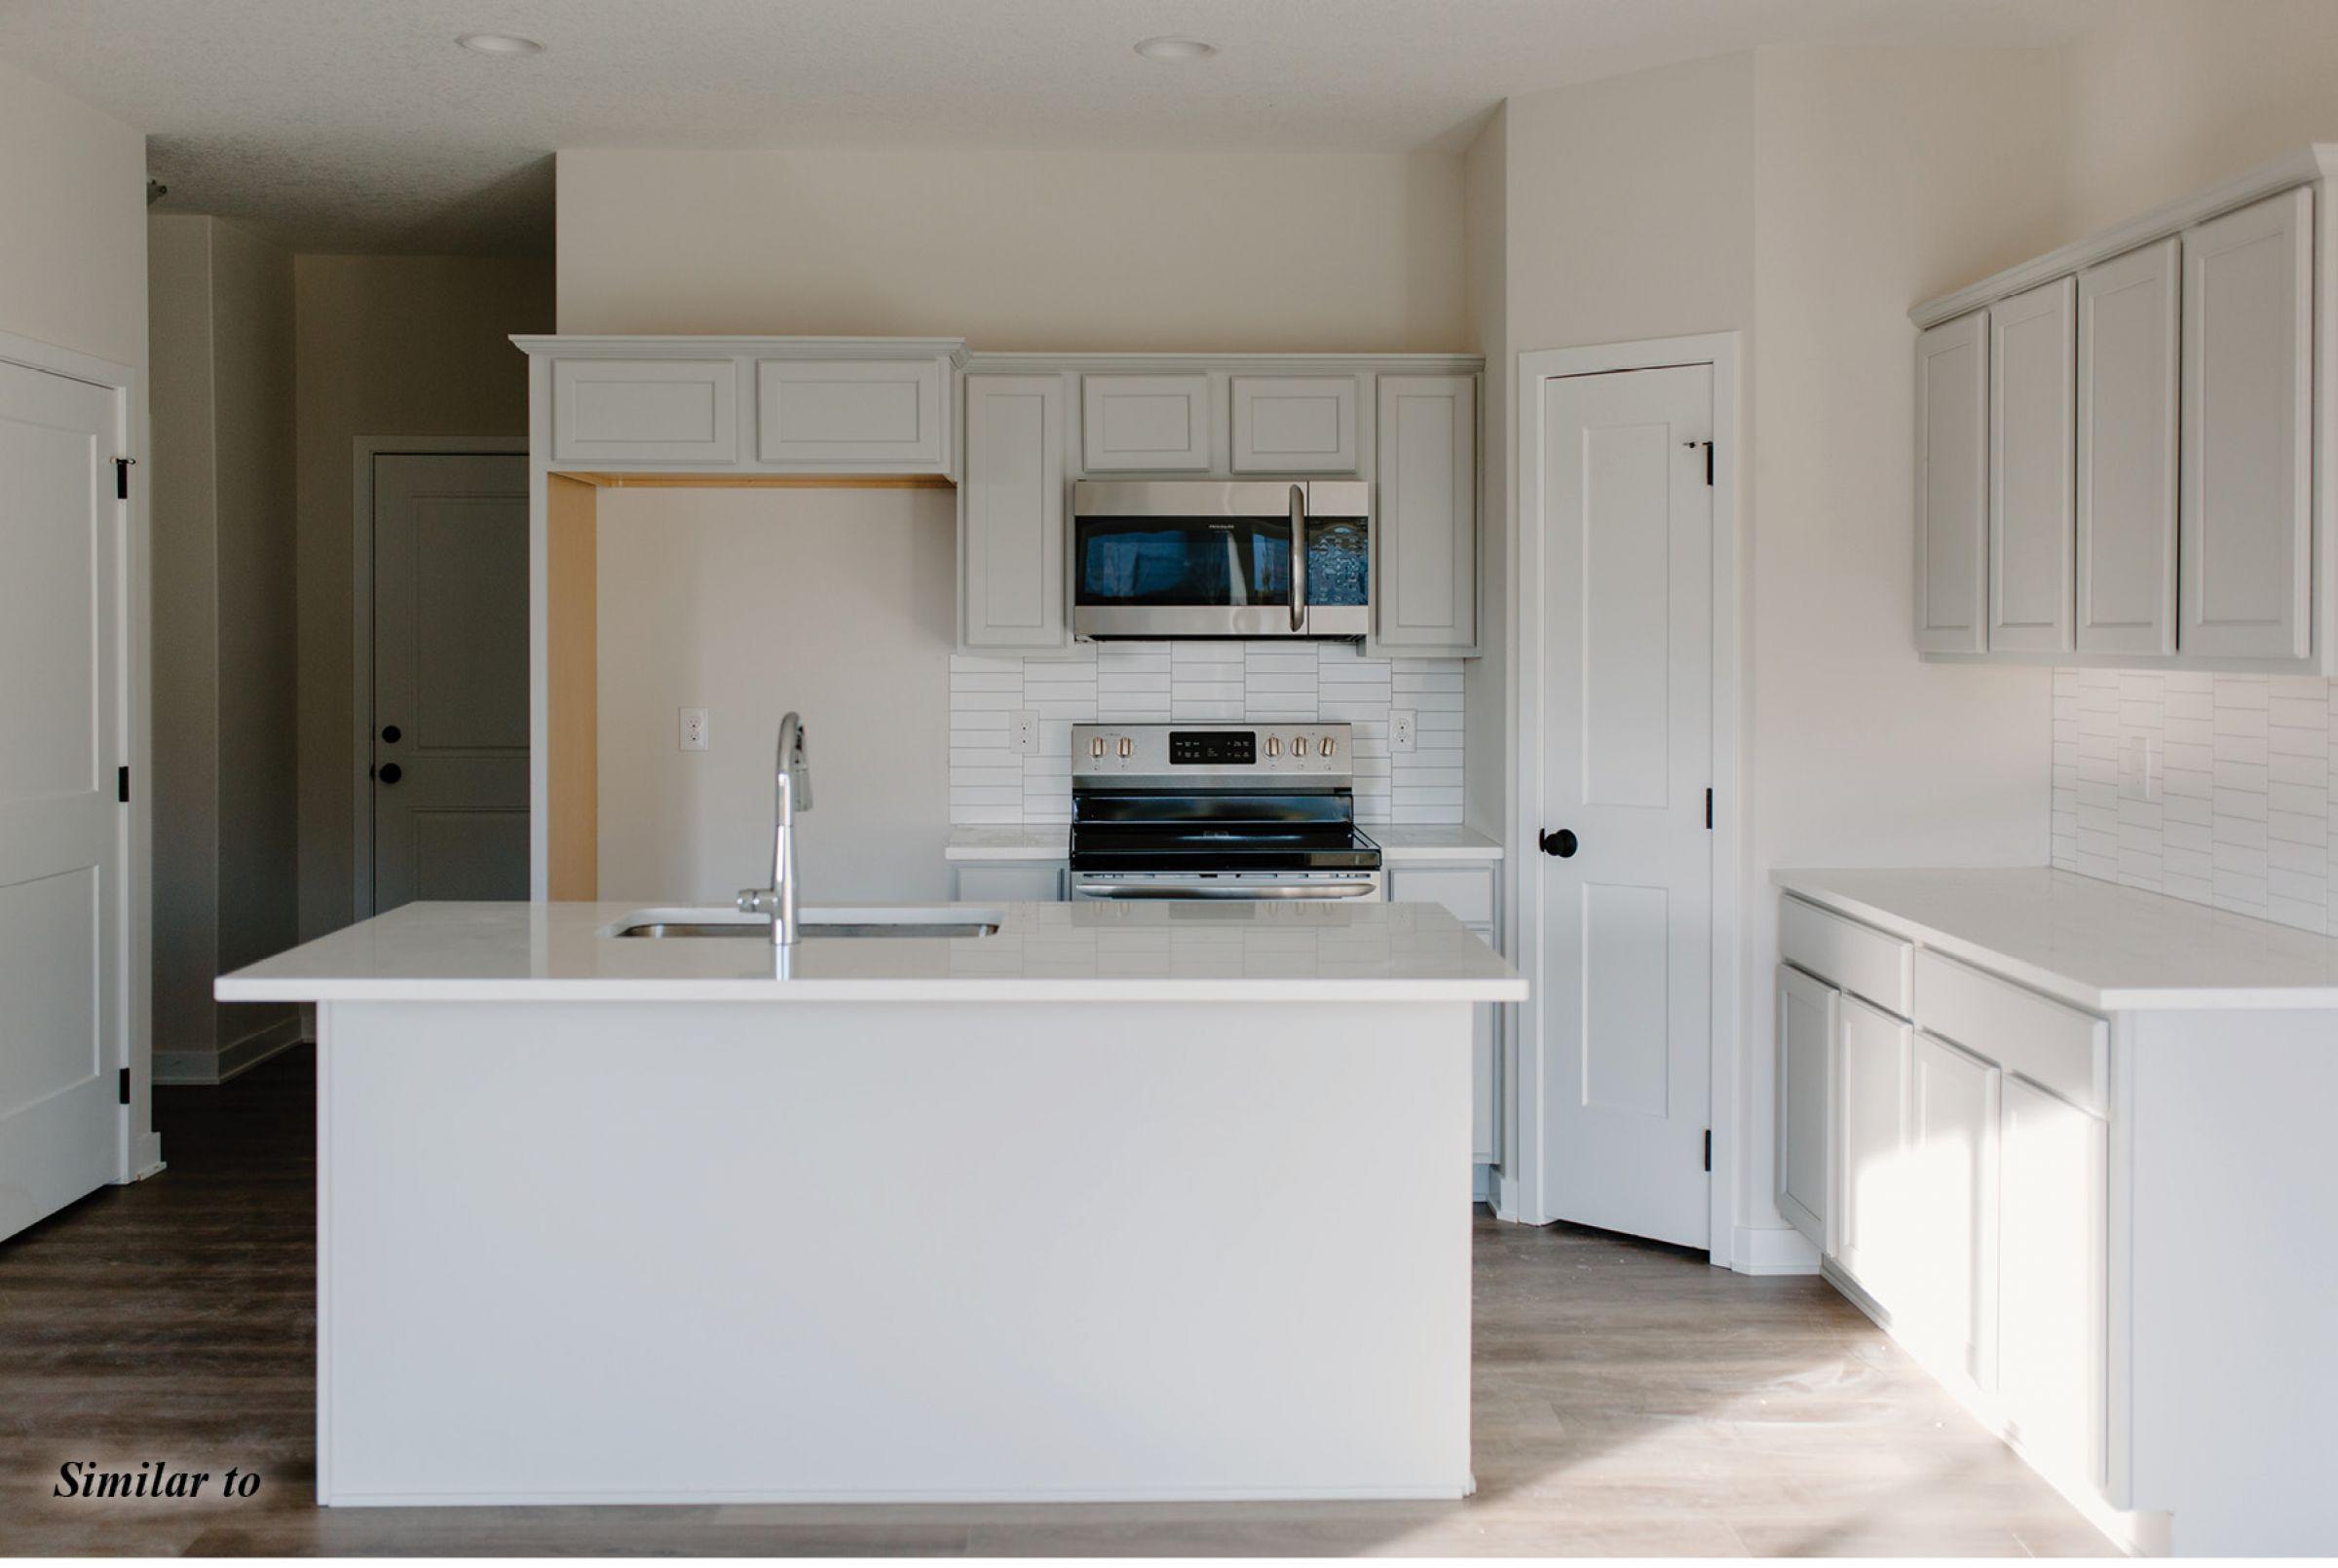 residential-warren-county-iowa-0-acres-listing-number-15676-2-2021-08-06-145014.jpg